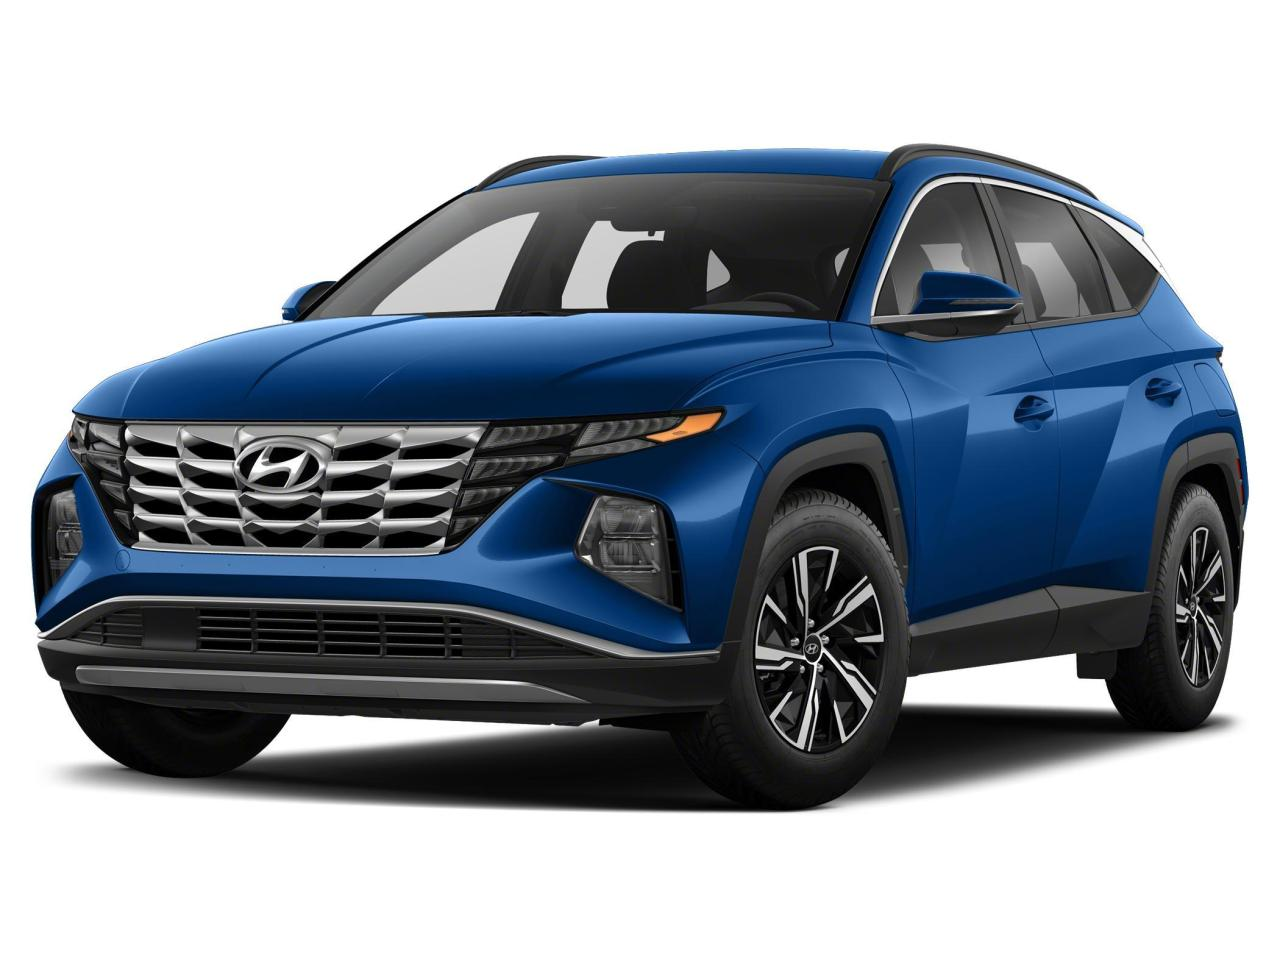 2022 Hyundai Tucson 1.6T AWD LUXURY HYBRID NO OPTIONS